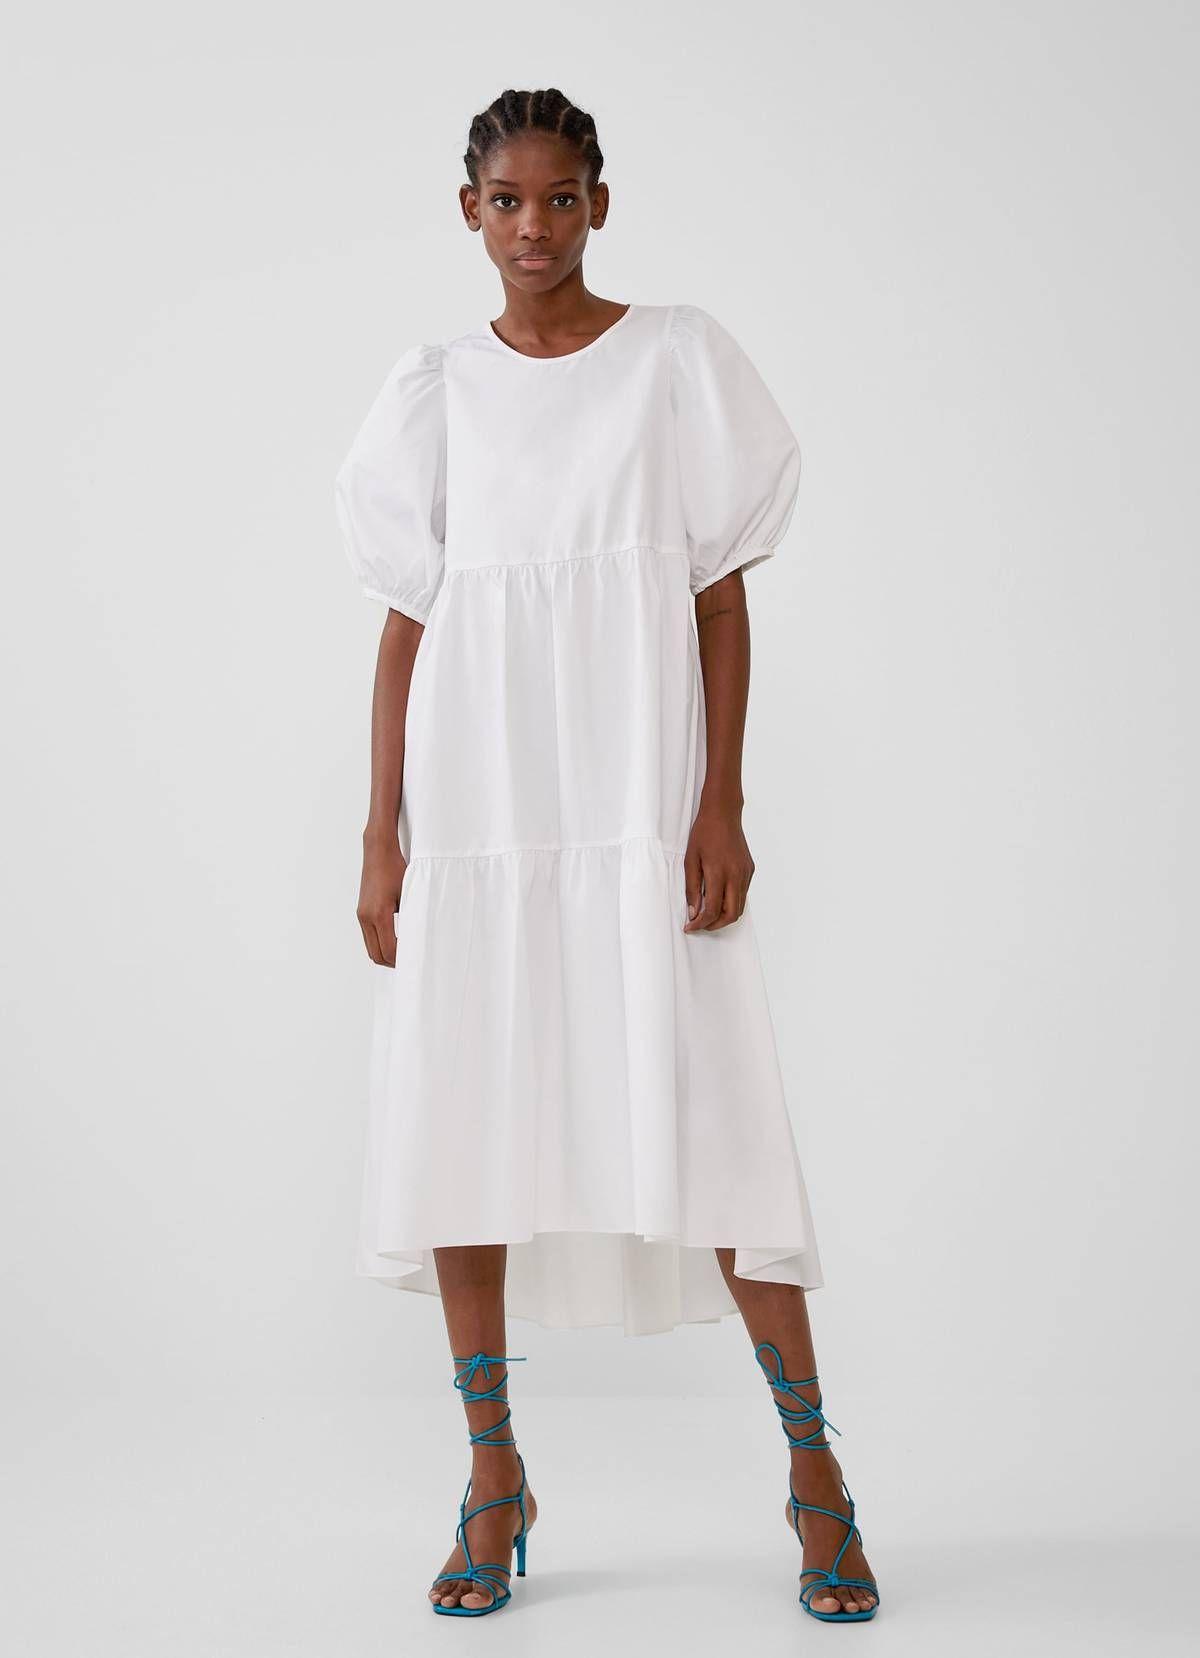 zara poplin white dress Promotions